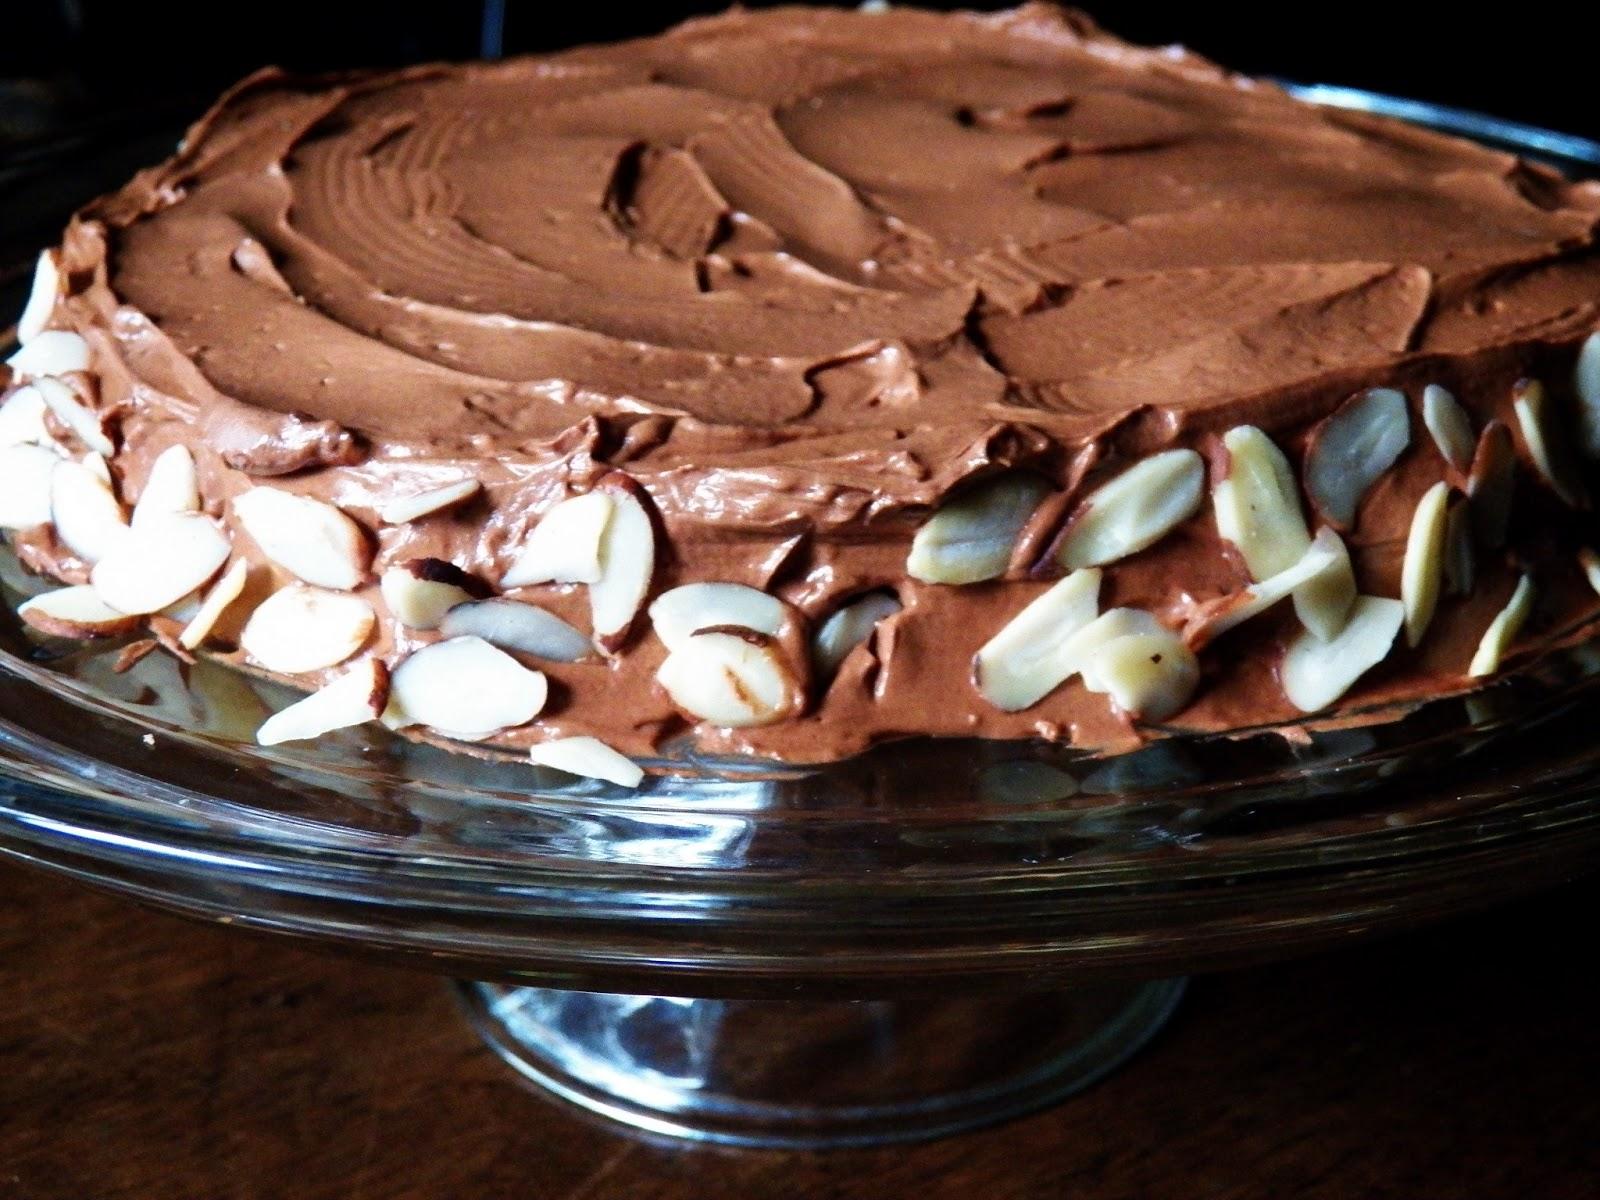 The Tasty Cheapskate: Julia Child's Chocolate Almond Cake